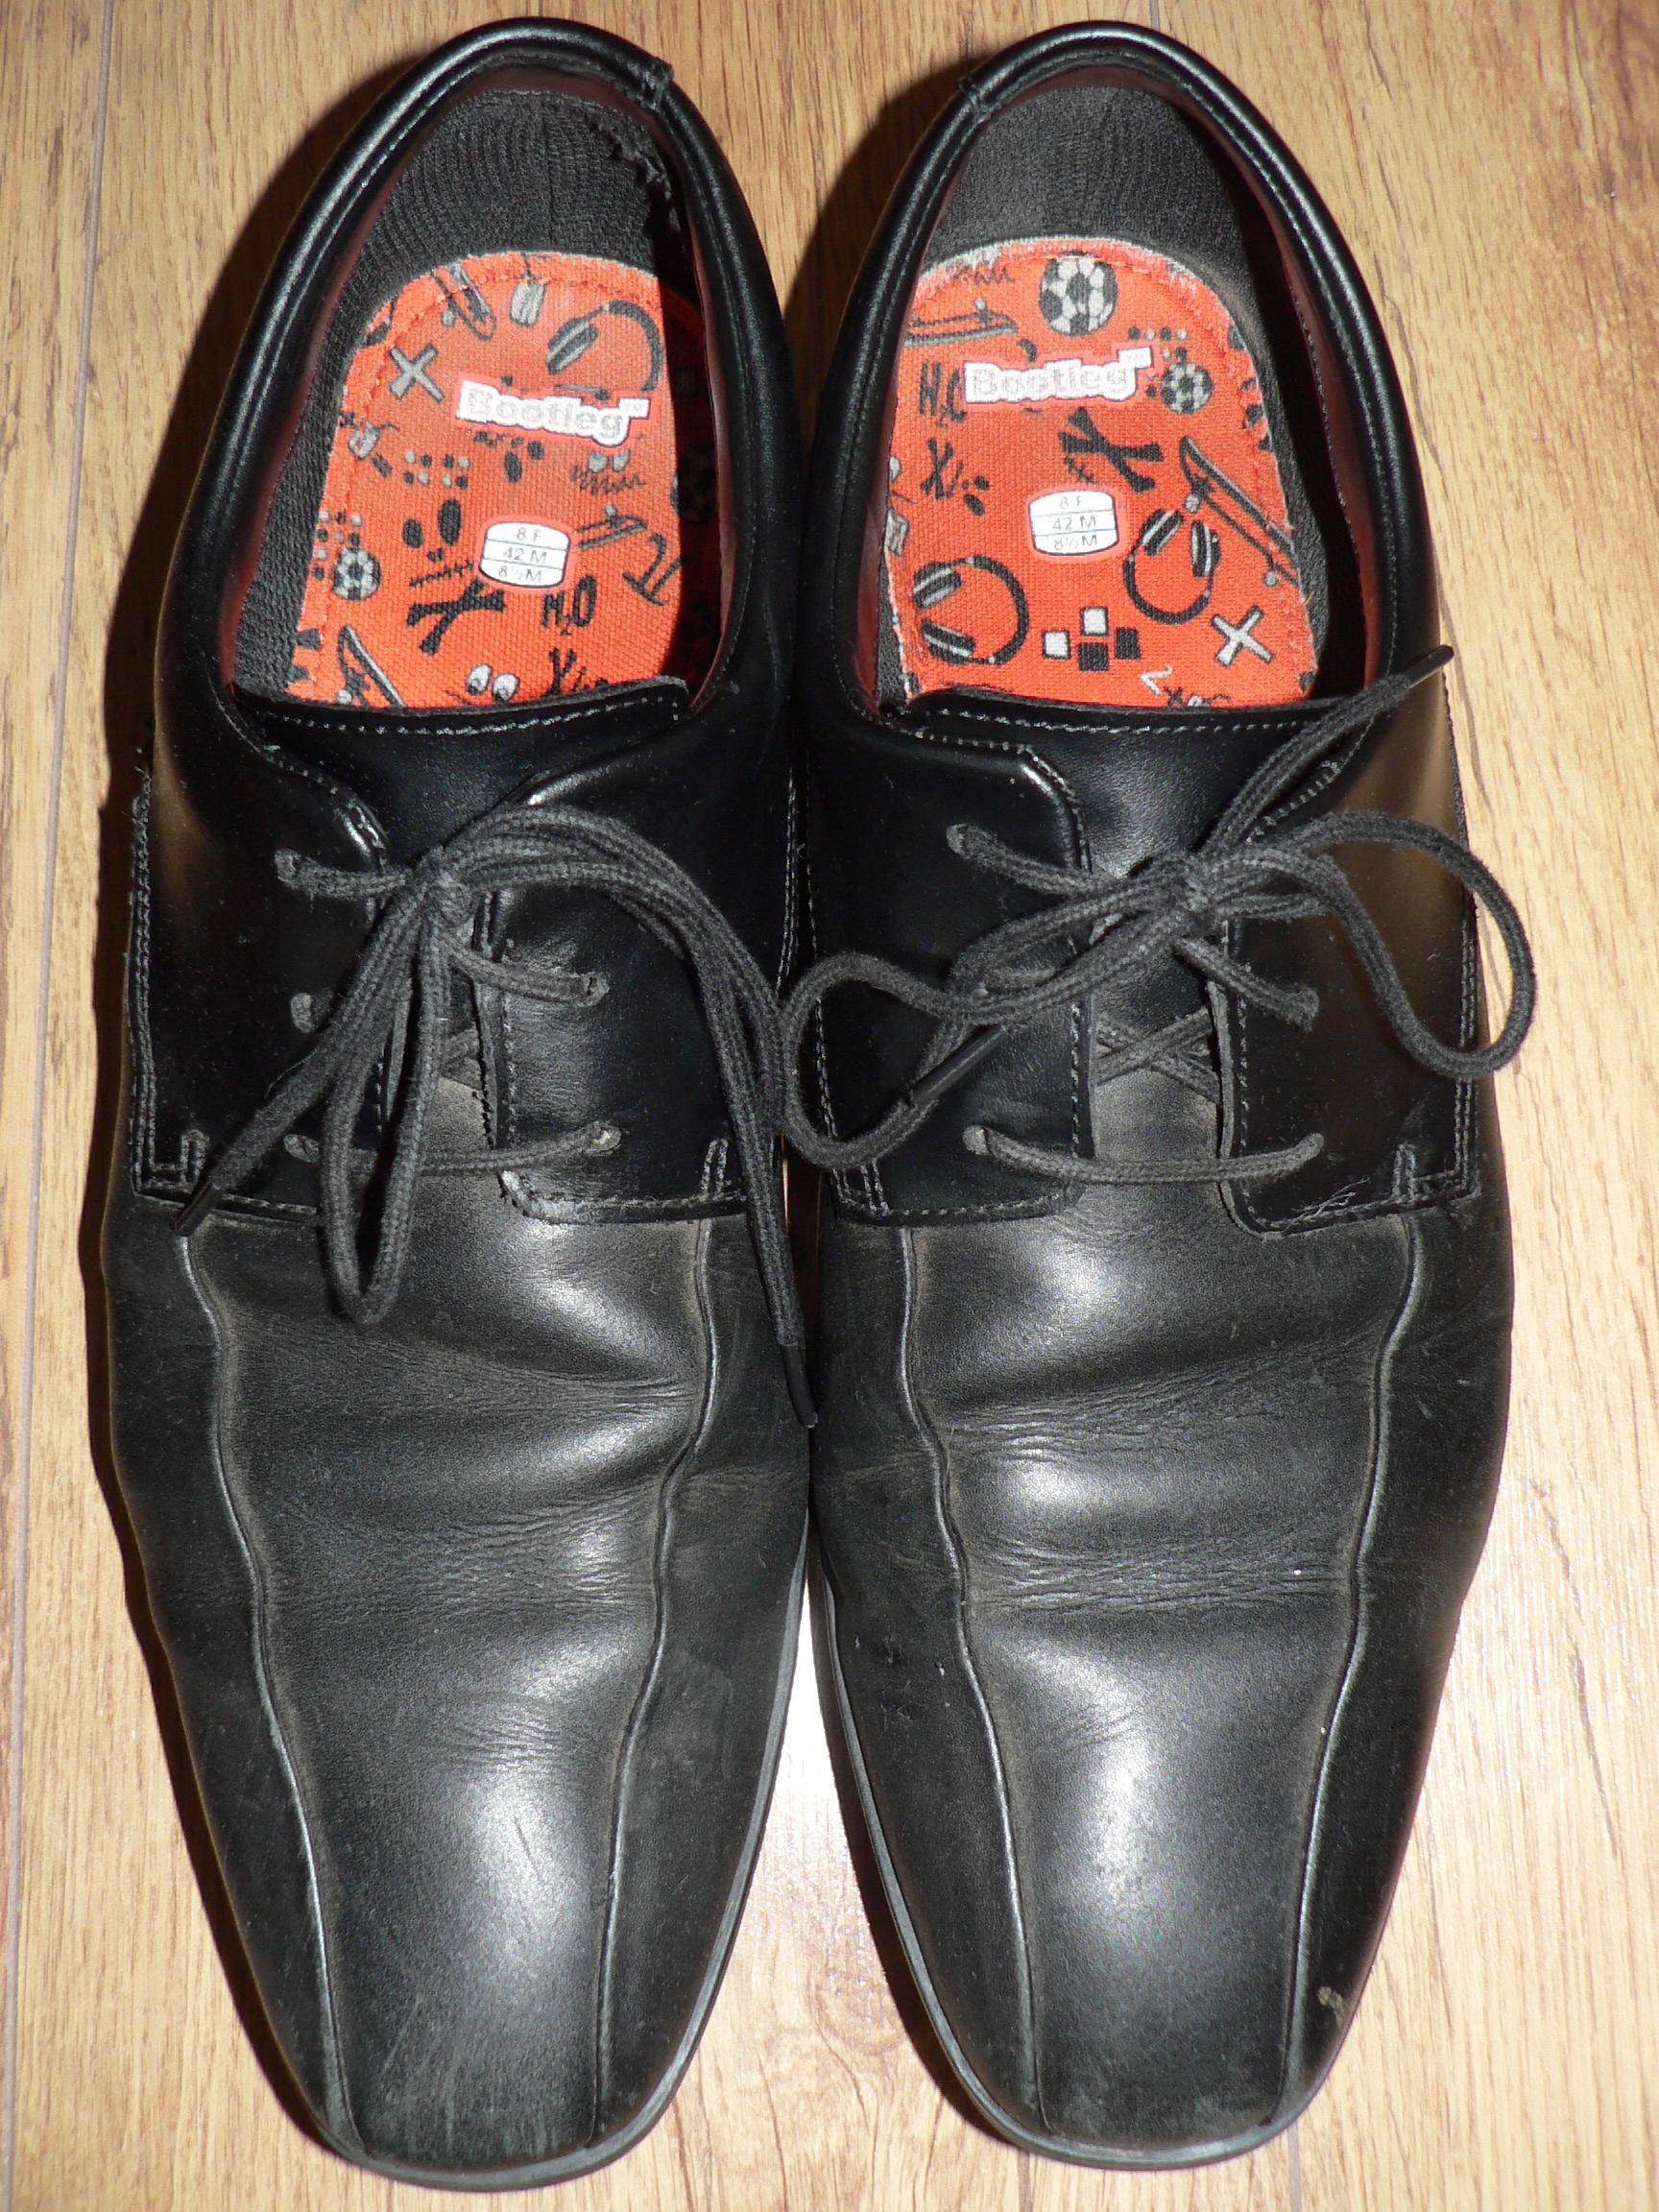 File:Clarks Willis Lad School Shoes (2